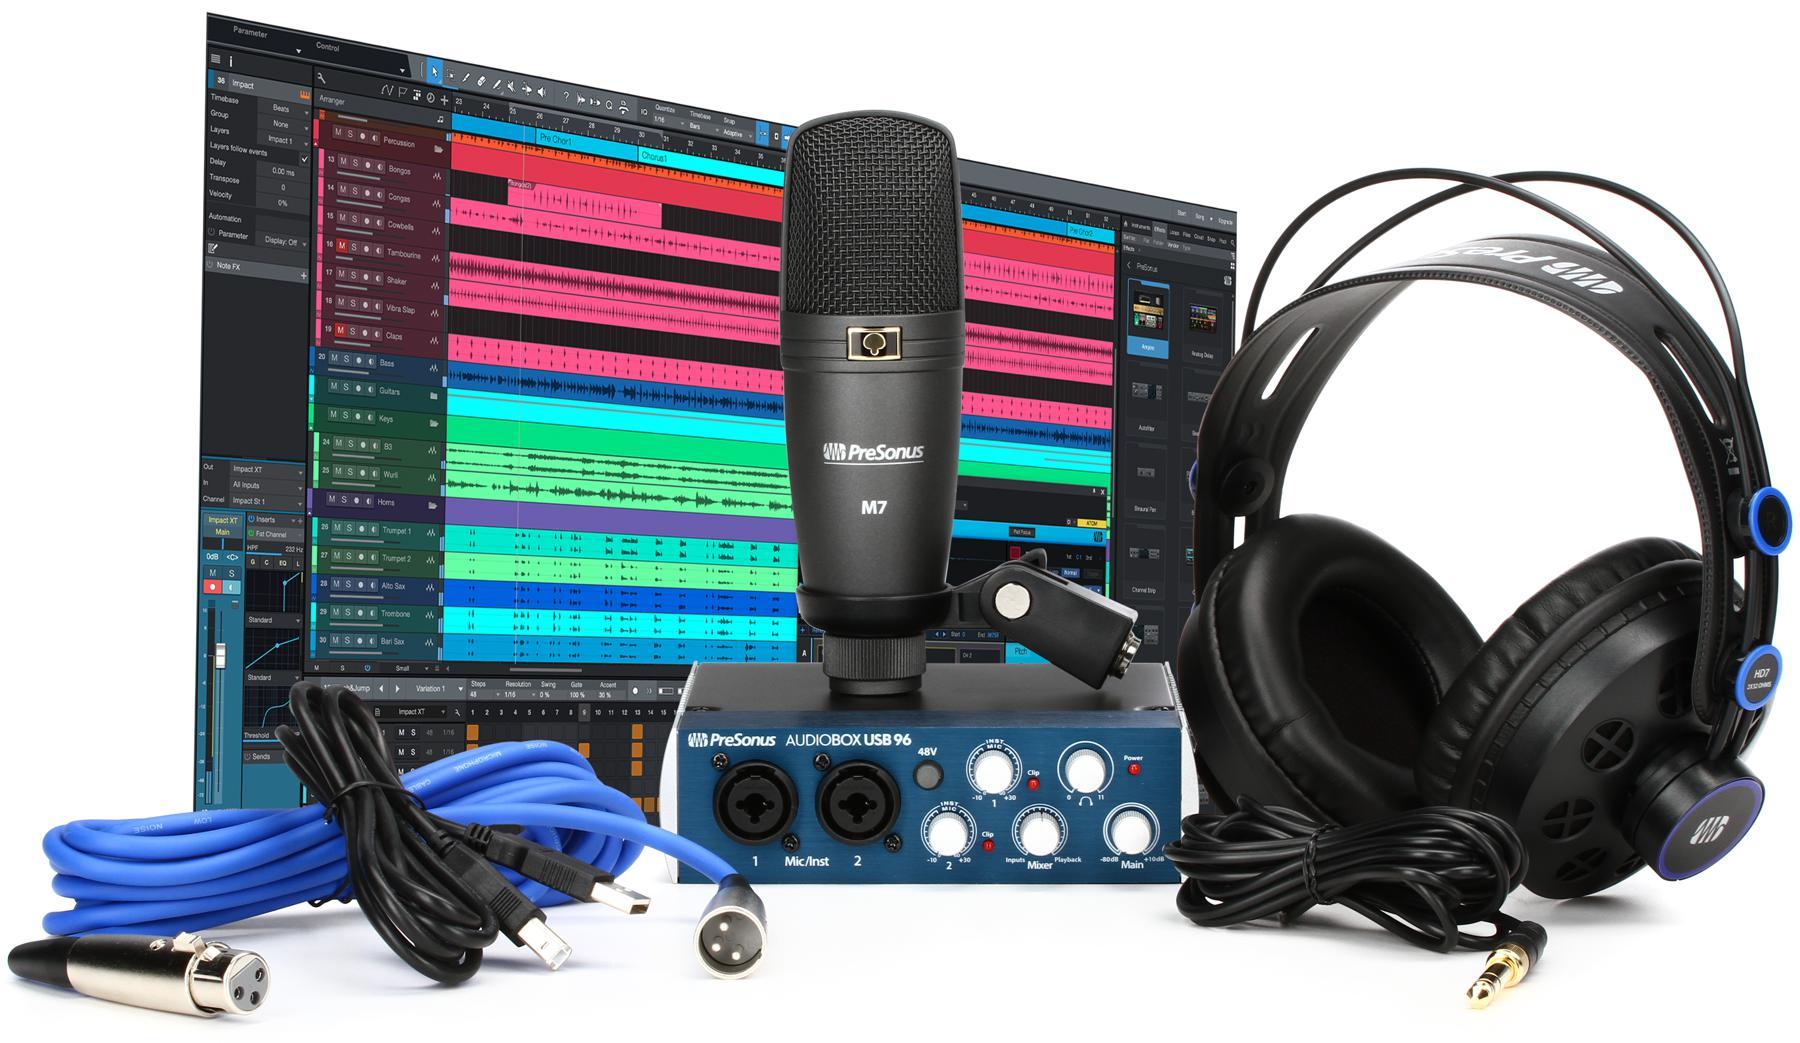 2. PreSonus AudioBox 96 Studio USB 2.0 Recording Bundle